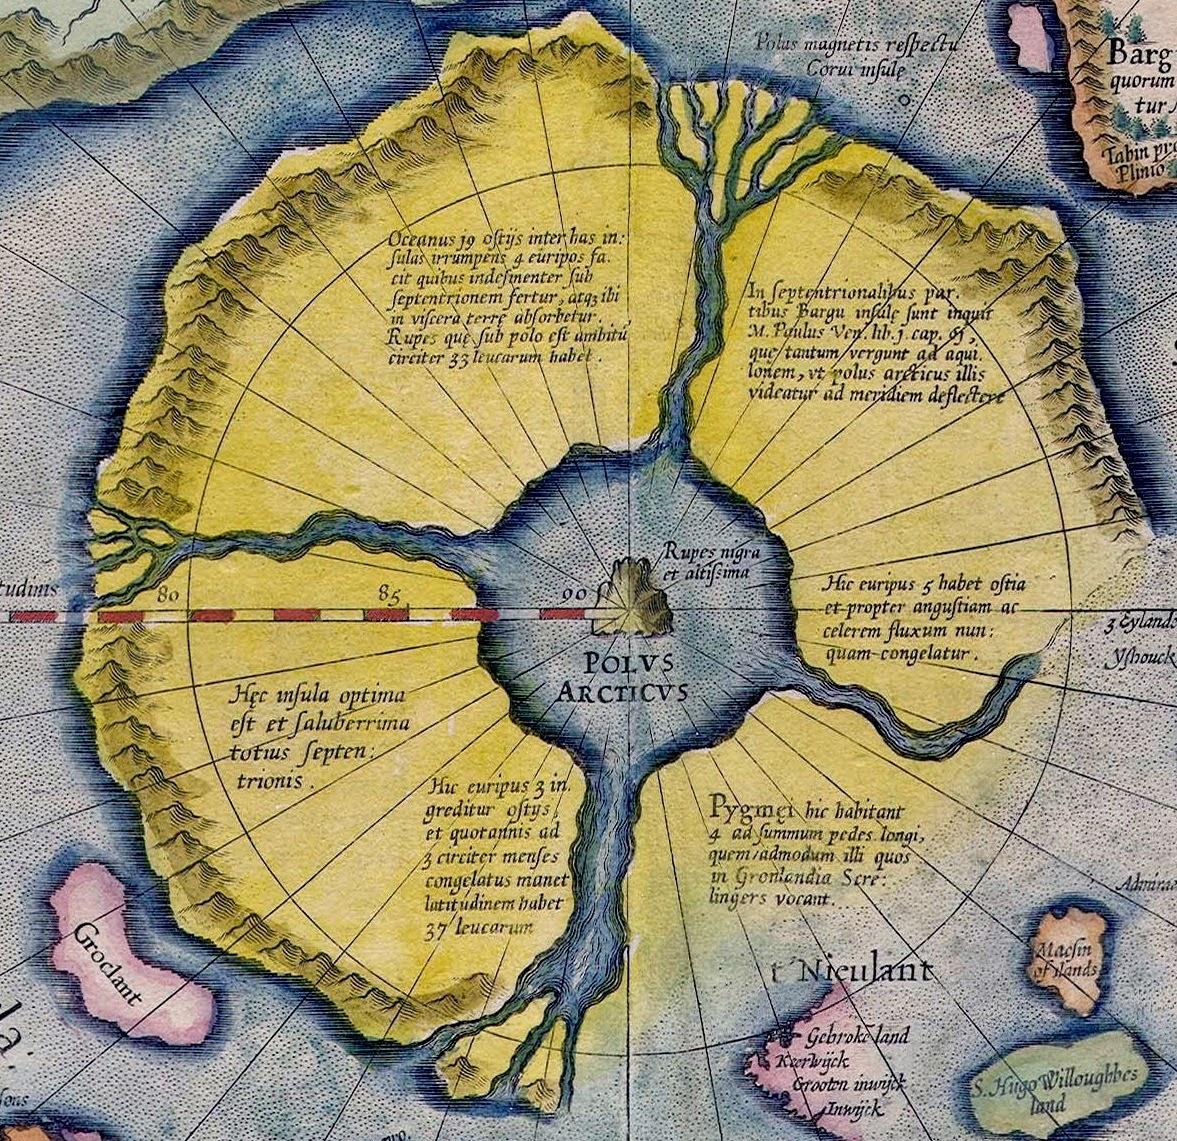 [Image: Mercator%27s%2Bnorth%2Bpole.jpg]